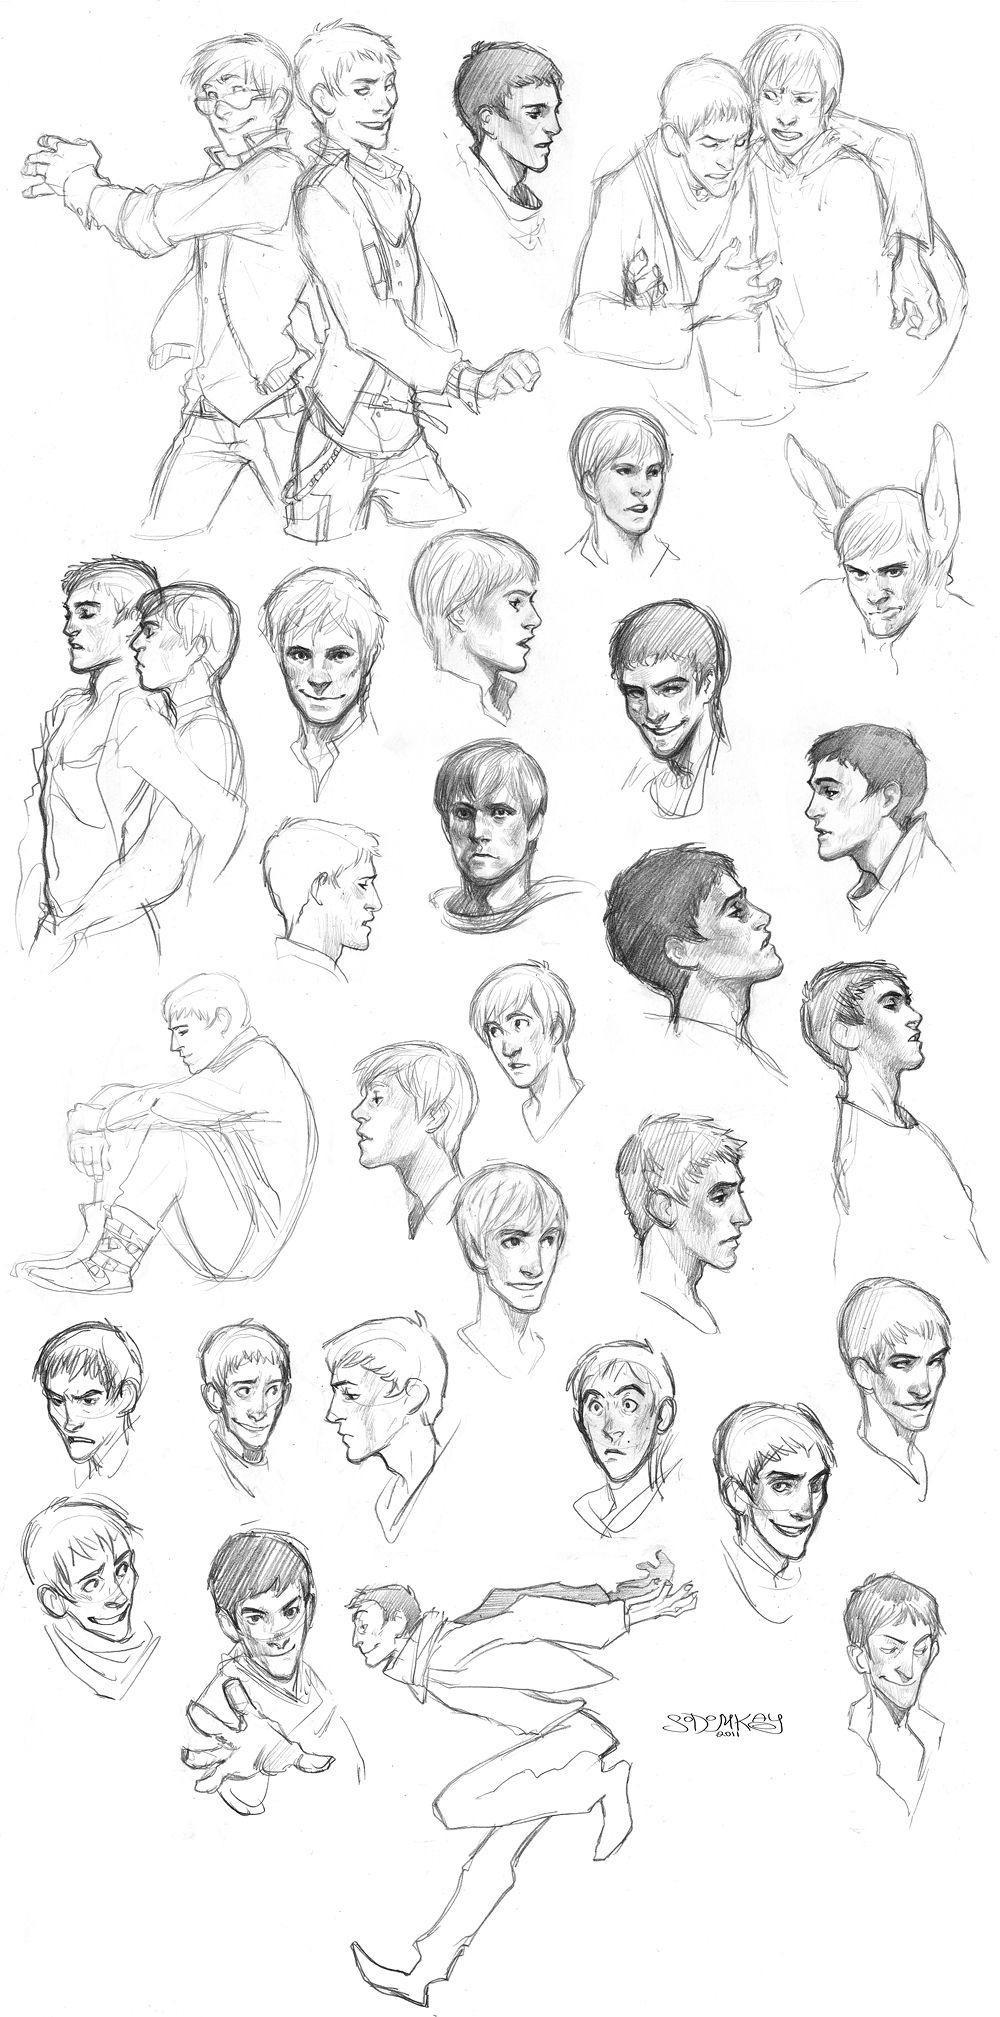 Merlin 11 sketches by *MisterKay on deviantART | Sketch | Pinterest ...